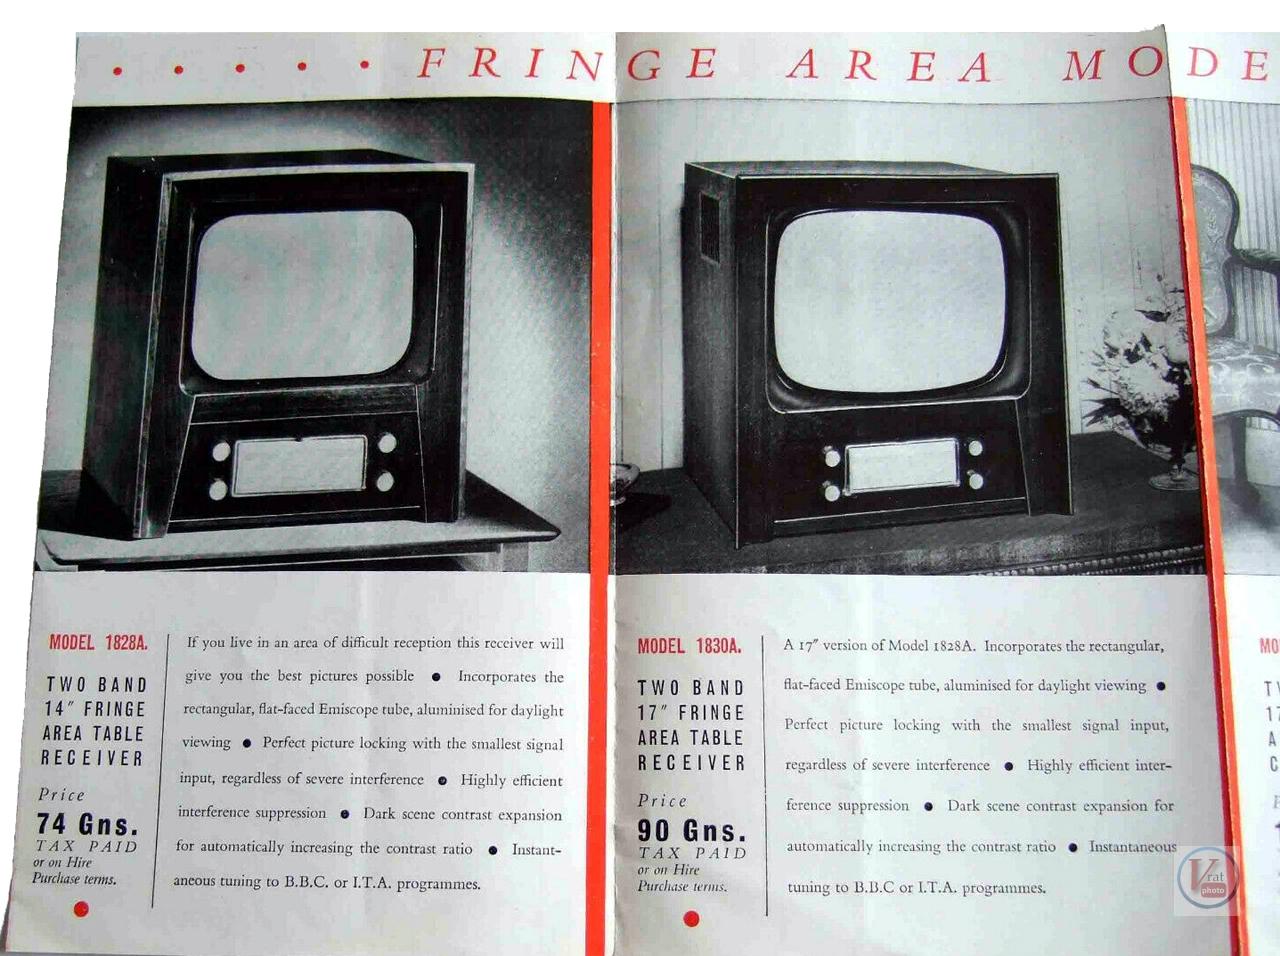 HMV B&W TV's 64